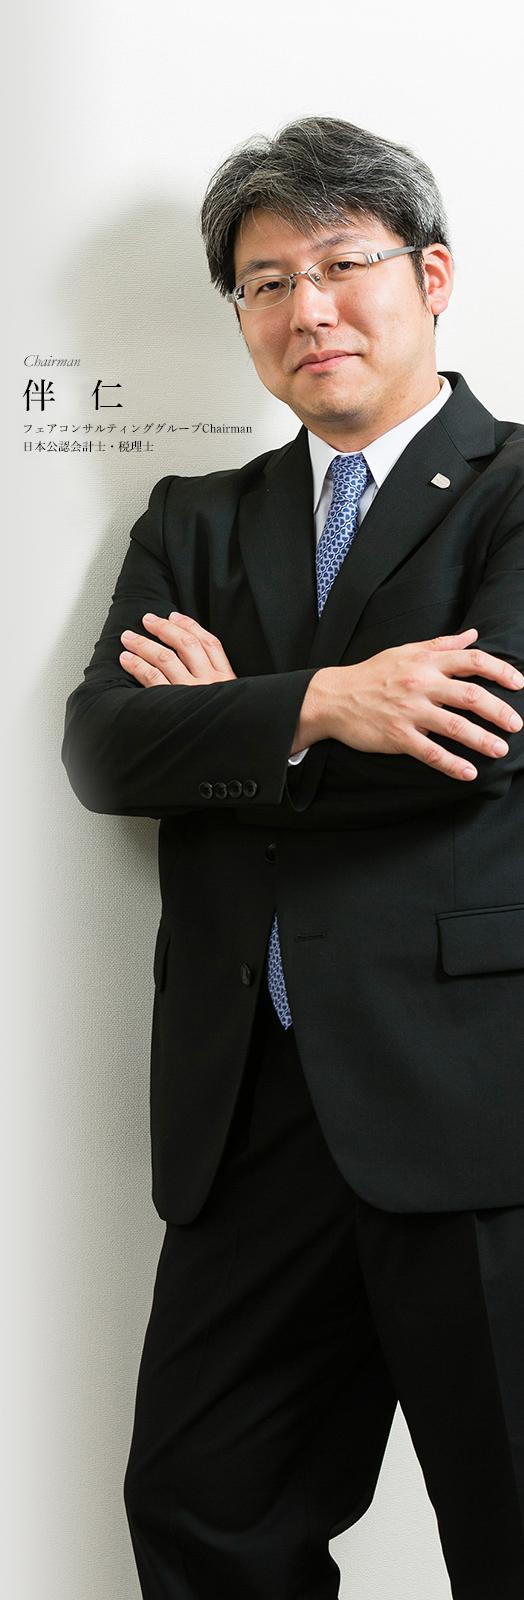 Chairman 伴 仁(ばん ひとし) フェアコンサルティンググループChairman 日本公認会計士・税理士